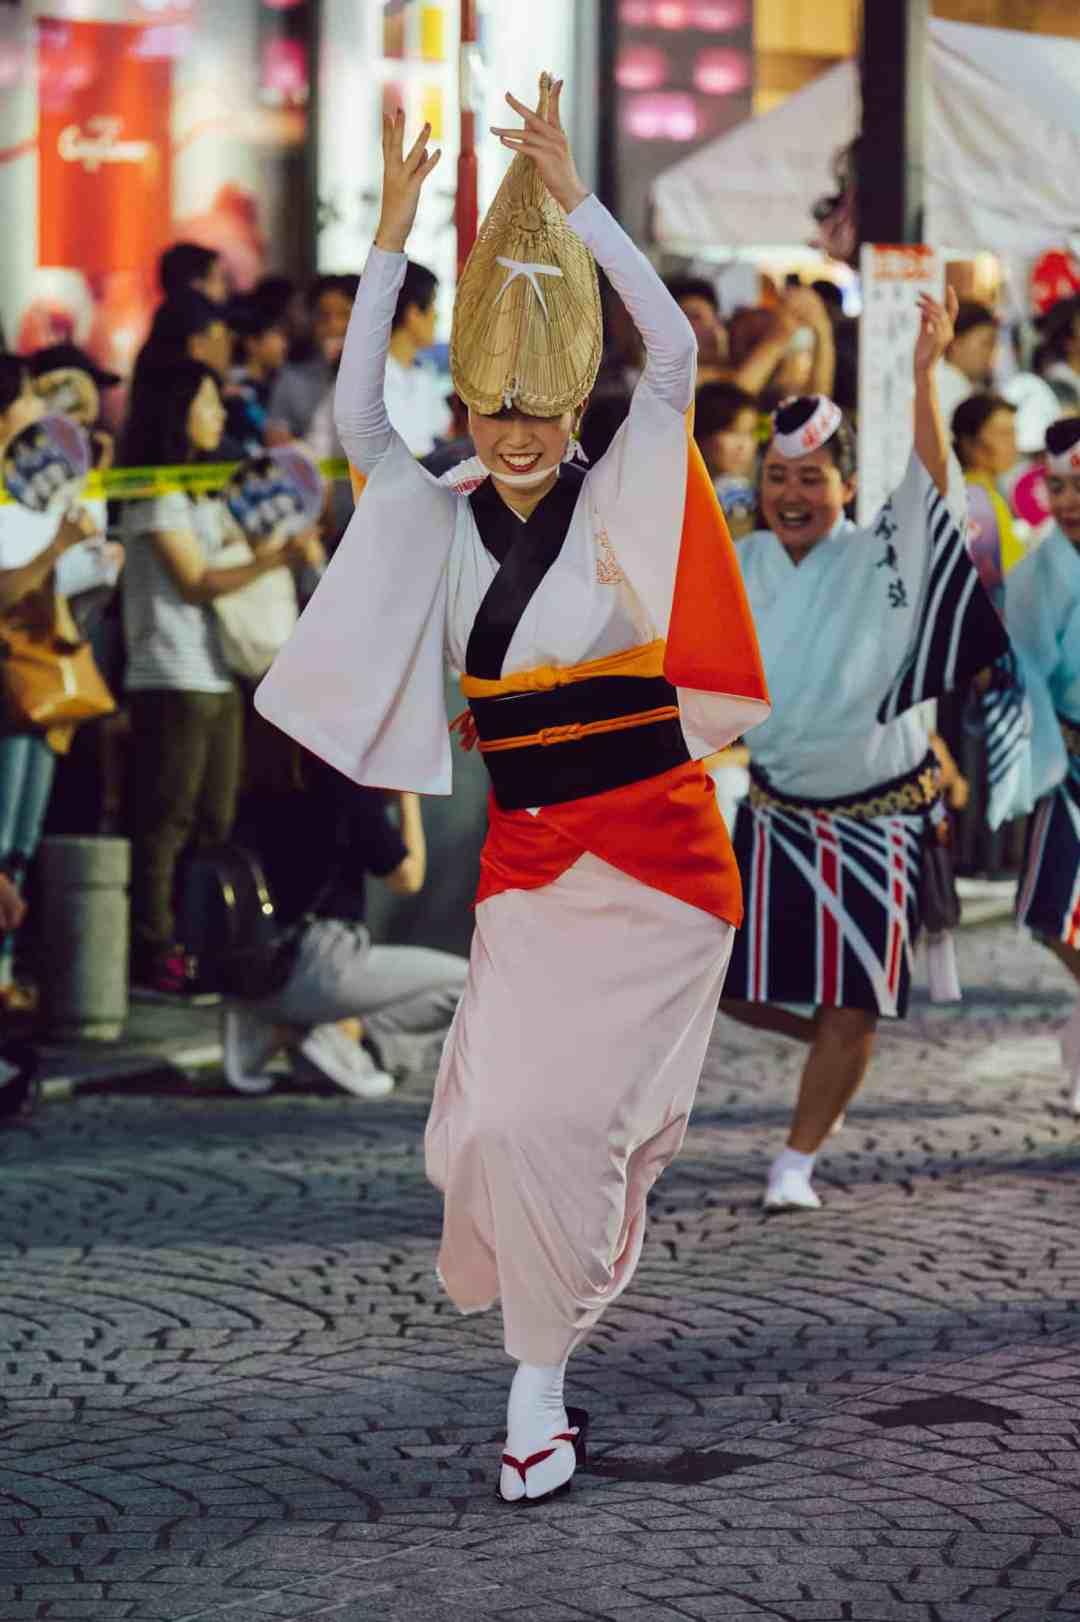 A Japanese woman dances in an Awa Odori festival in Tokyo, Japan.